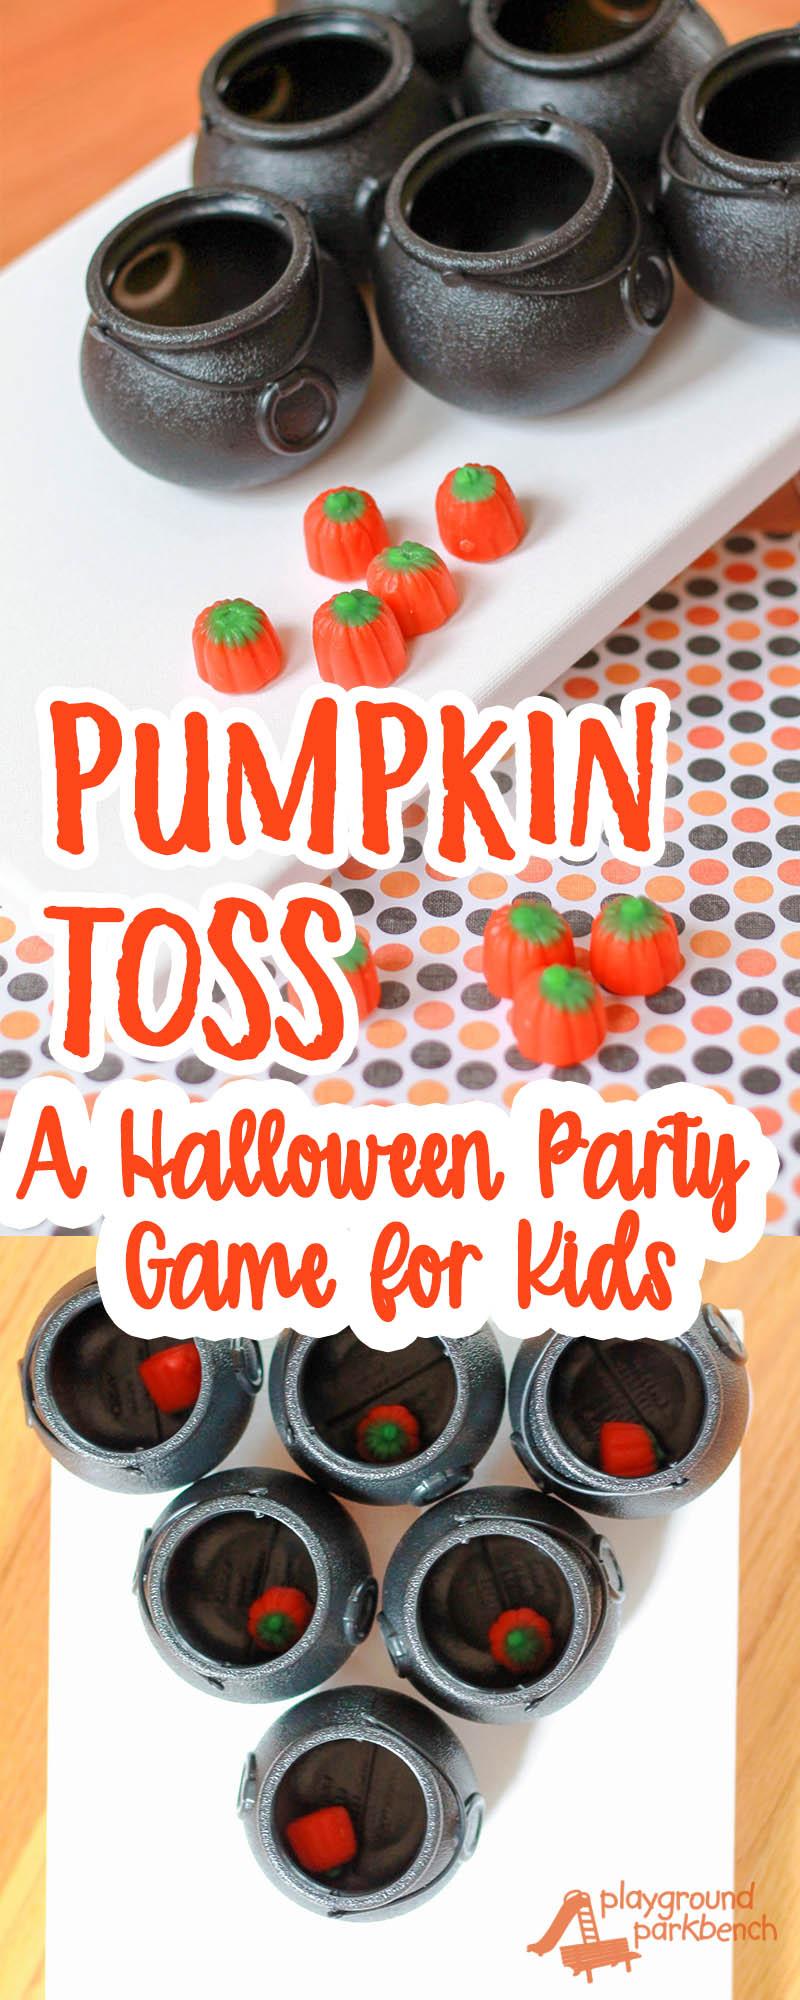 Pumpkin Toss Simple Party Games For Children